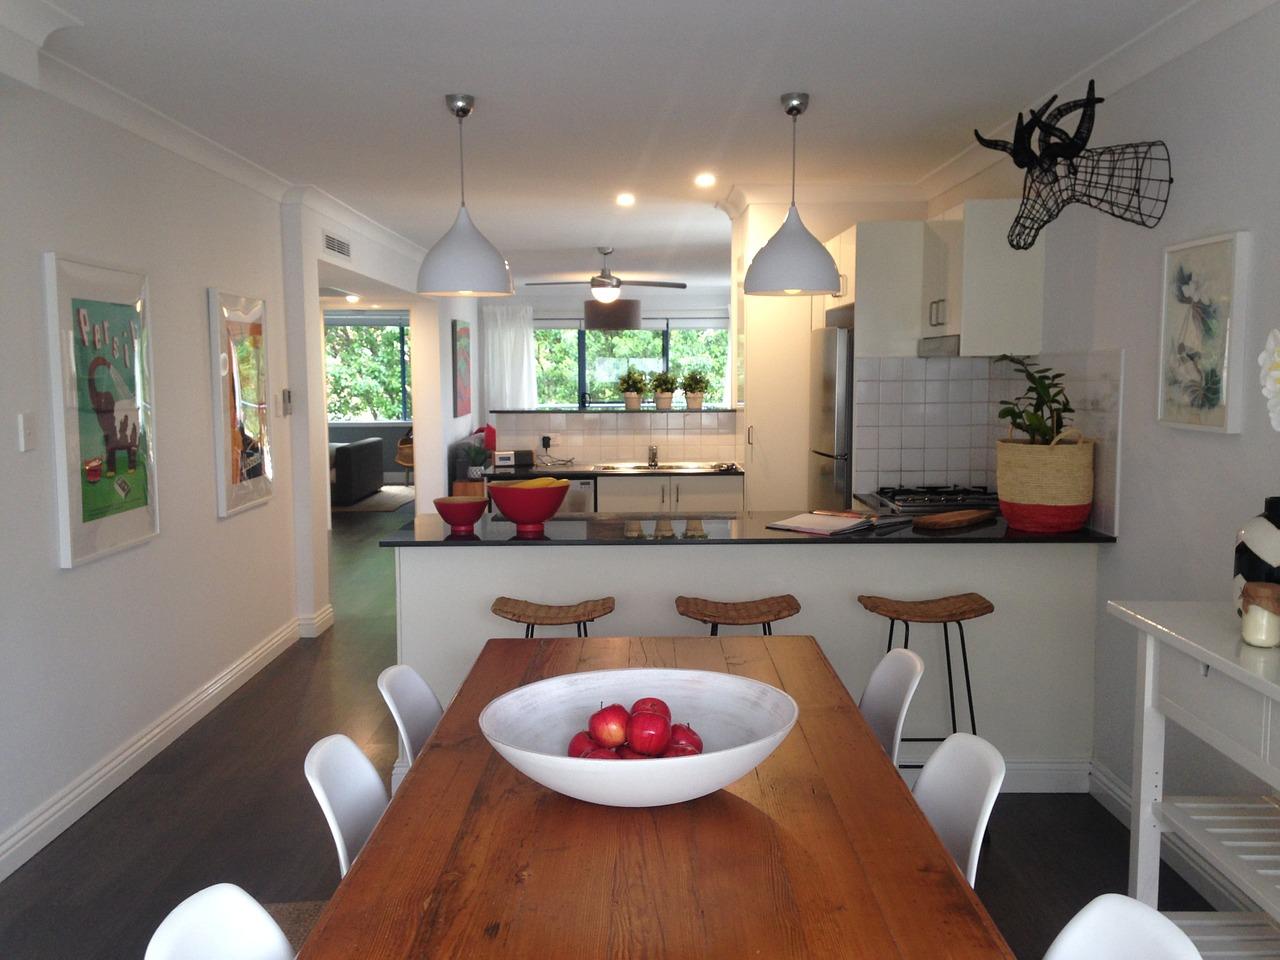 Image 6 - Dining Room